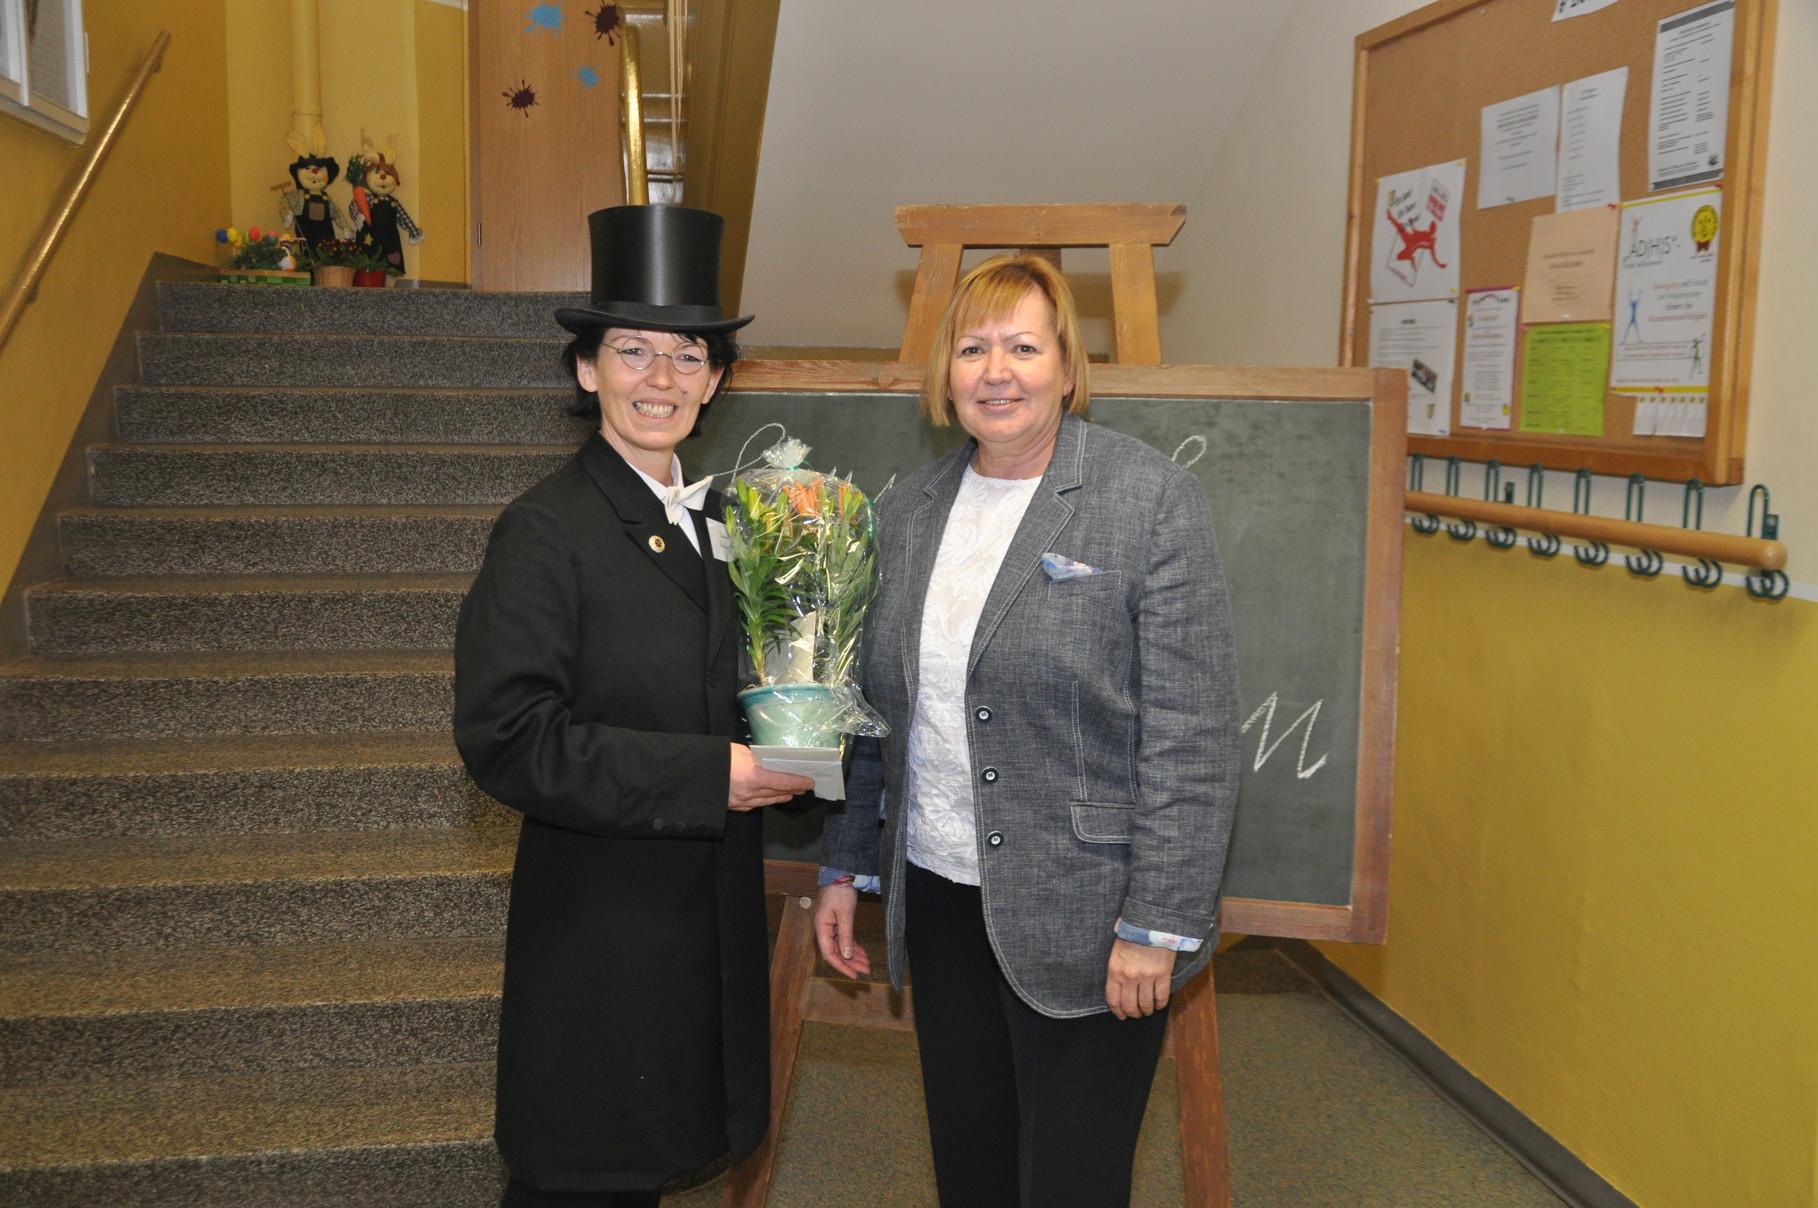 Landtagsabgeordnete Frau Ines Springer